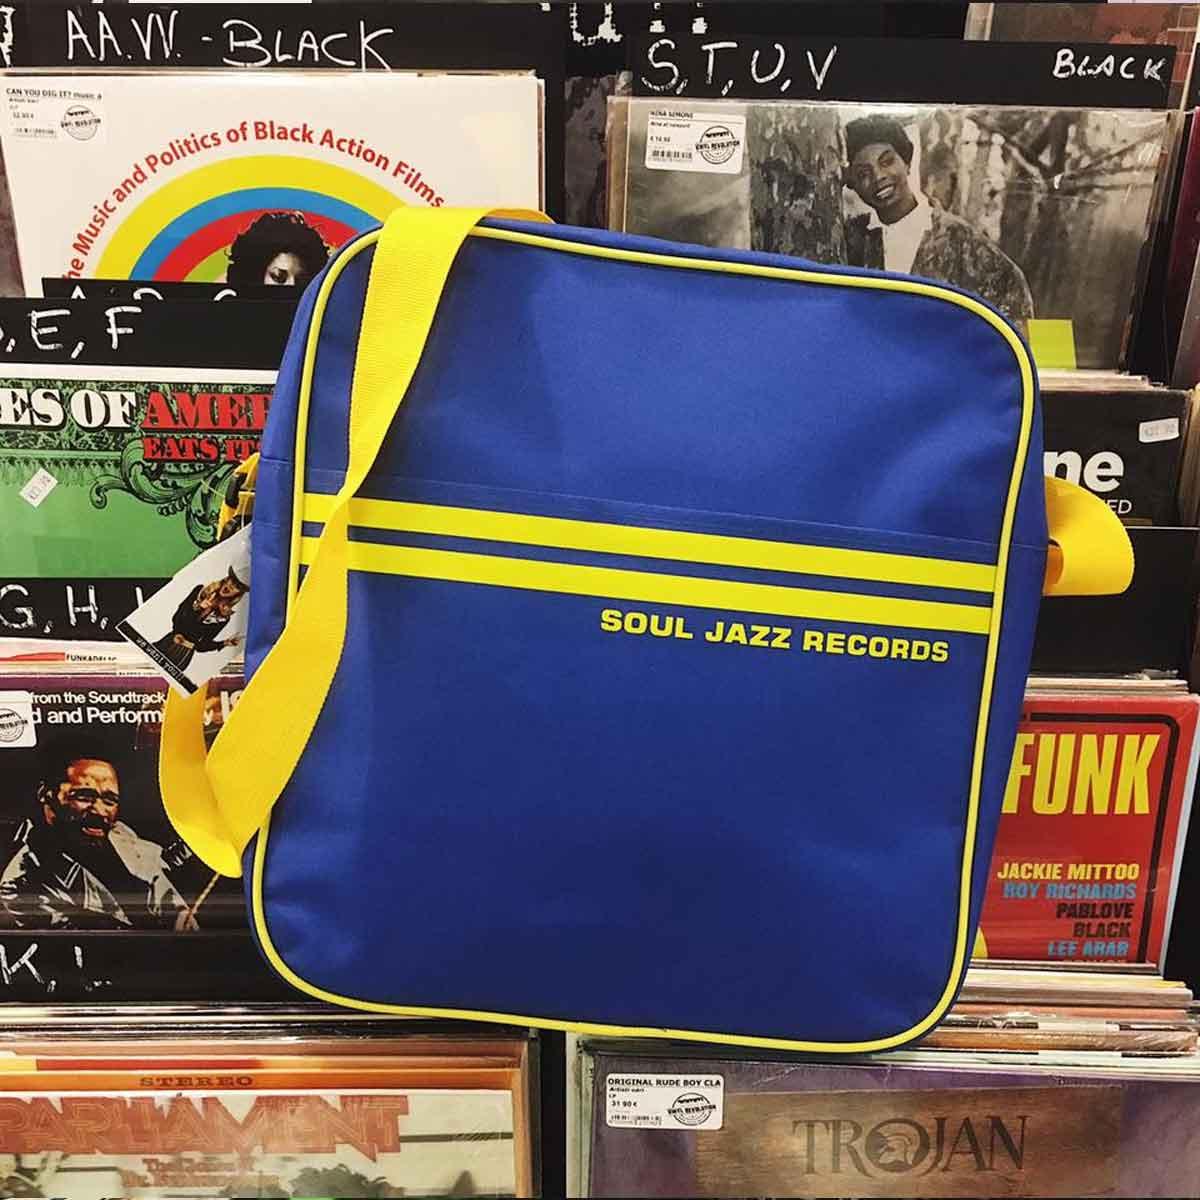 SOUL JAZZ RECORDS - Groovy bag